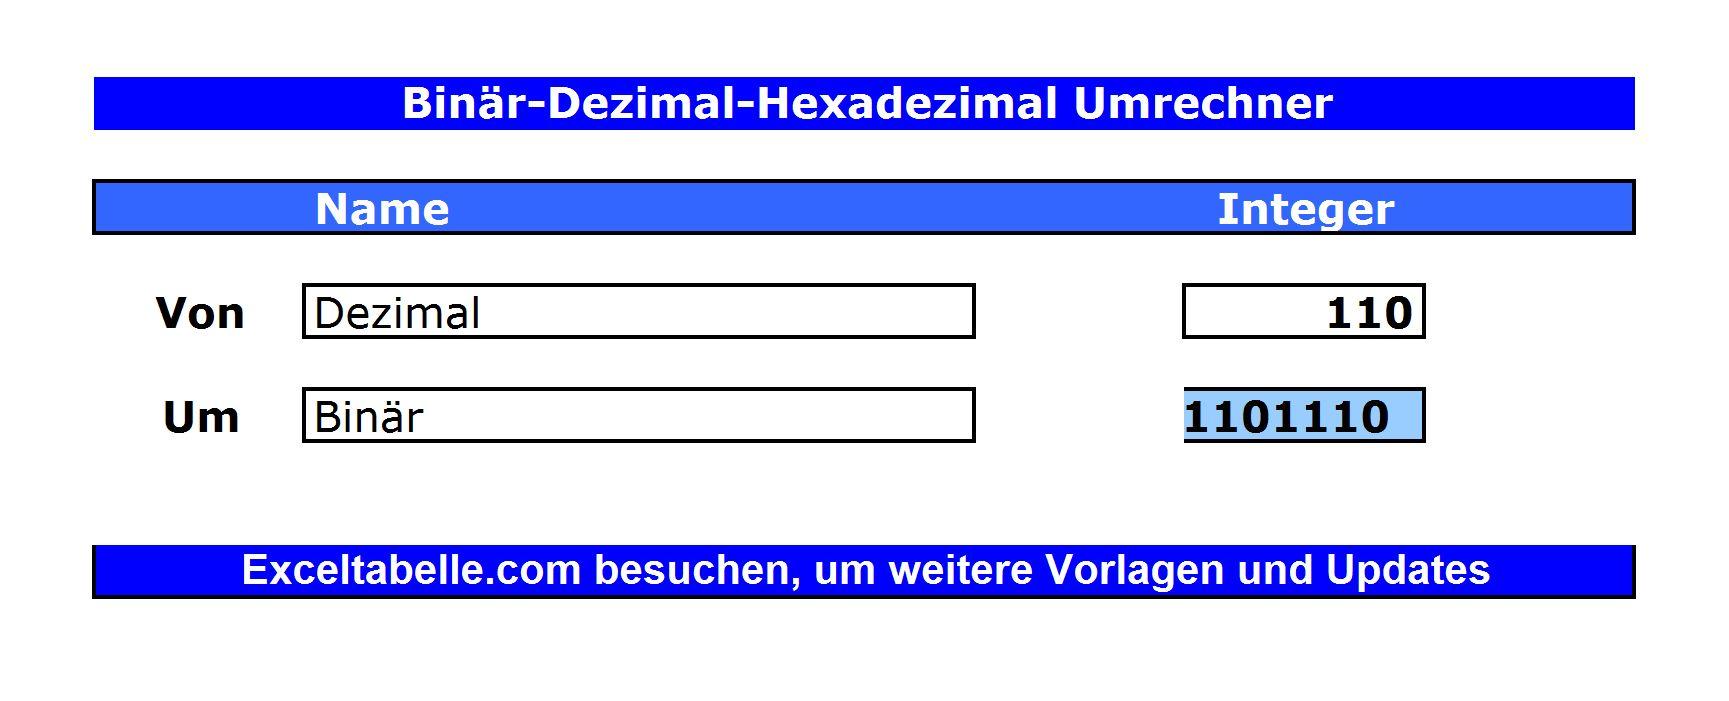 Binär-Dezimal-Hexadezimal-Umrechner